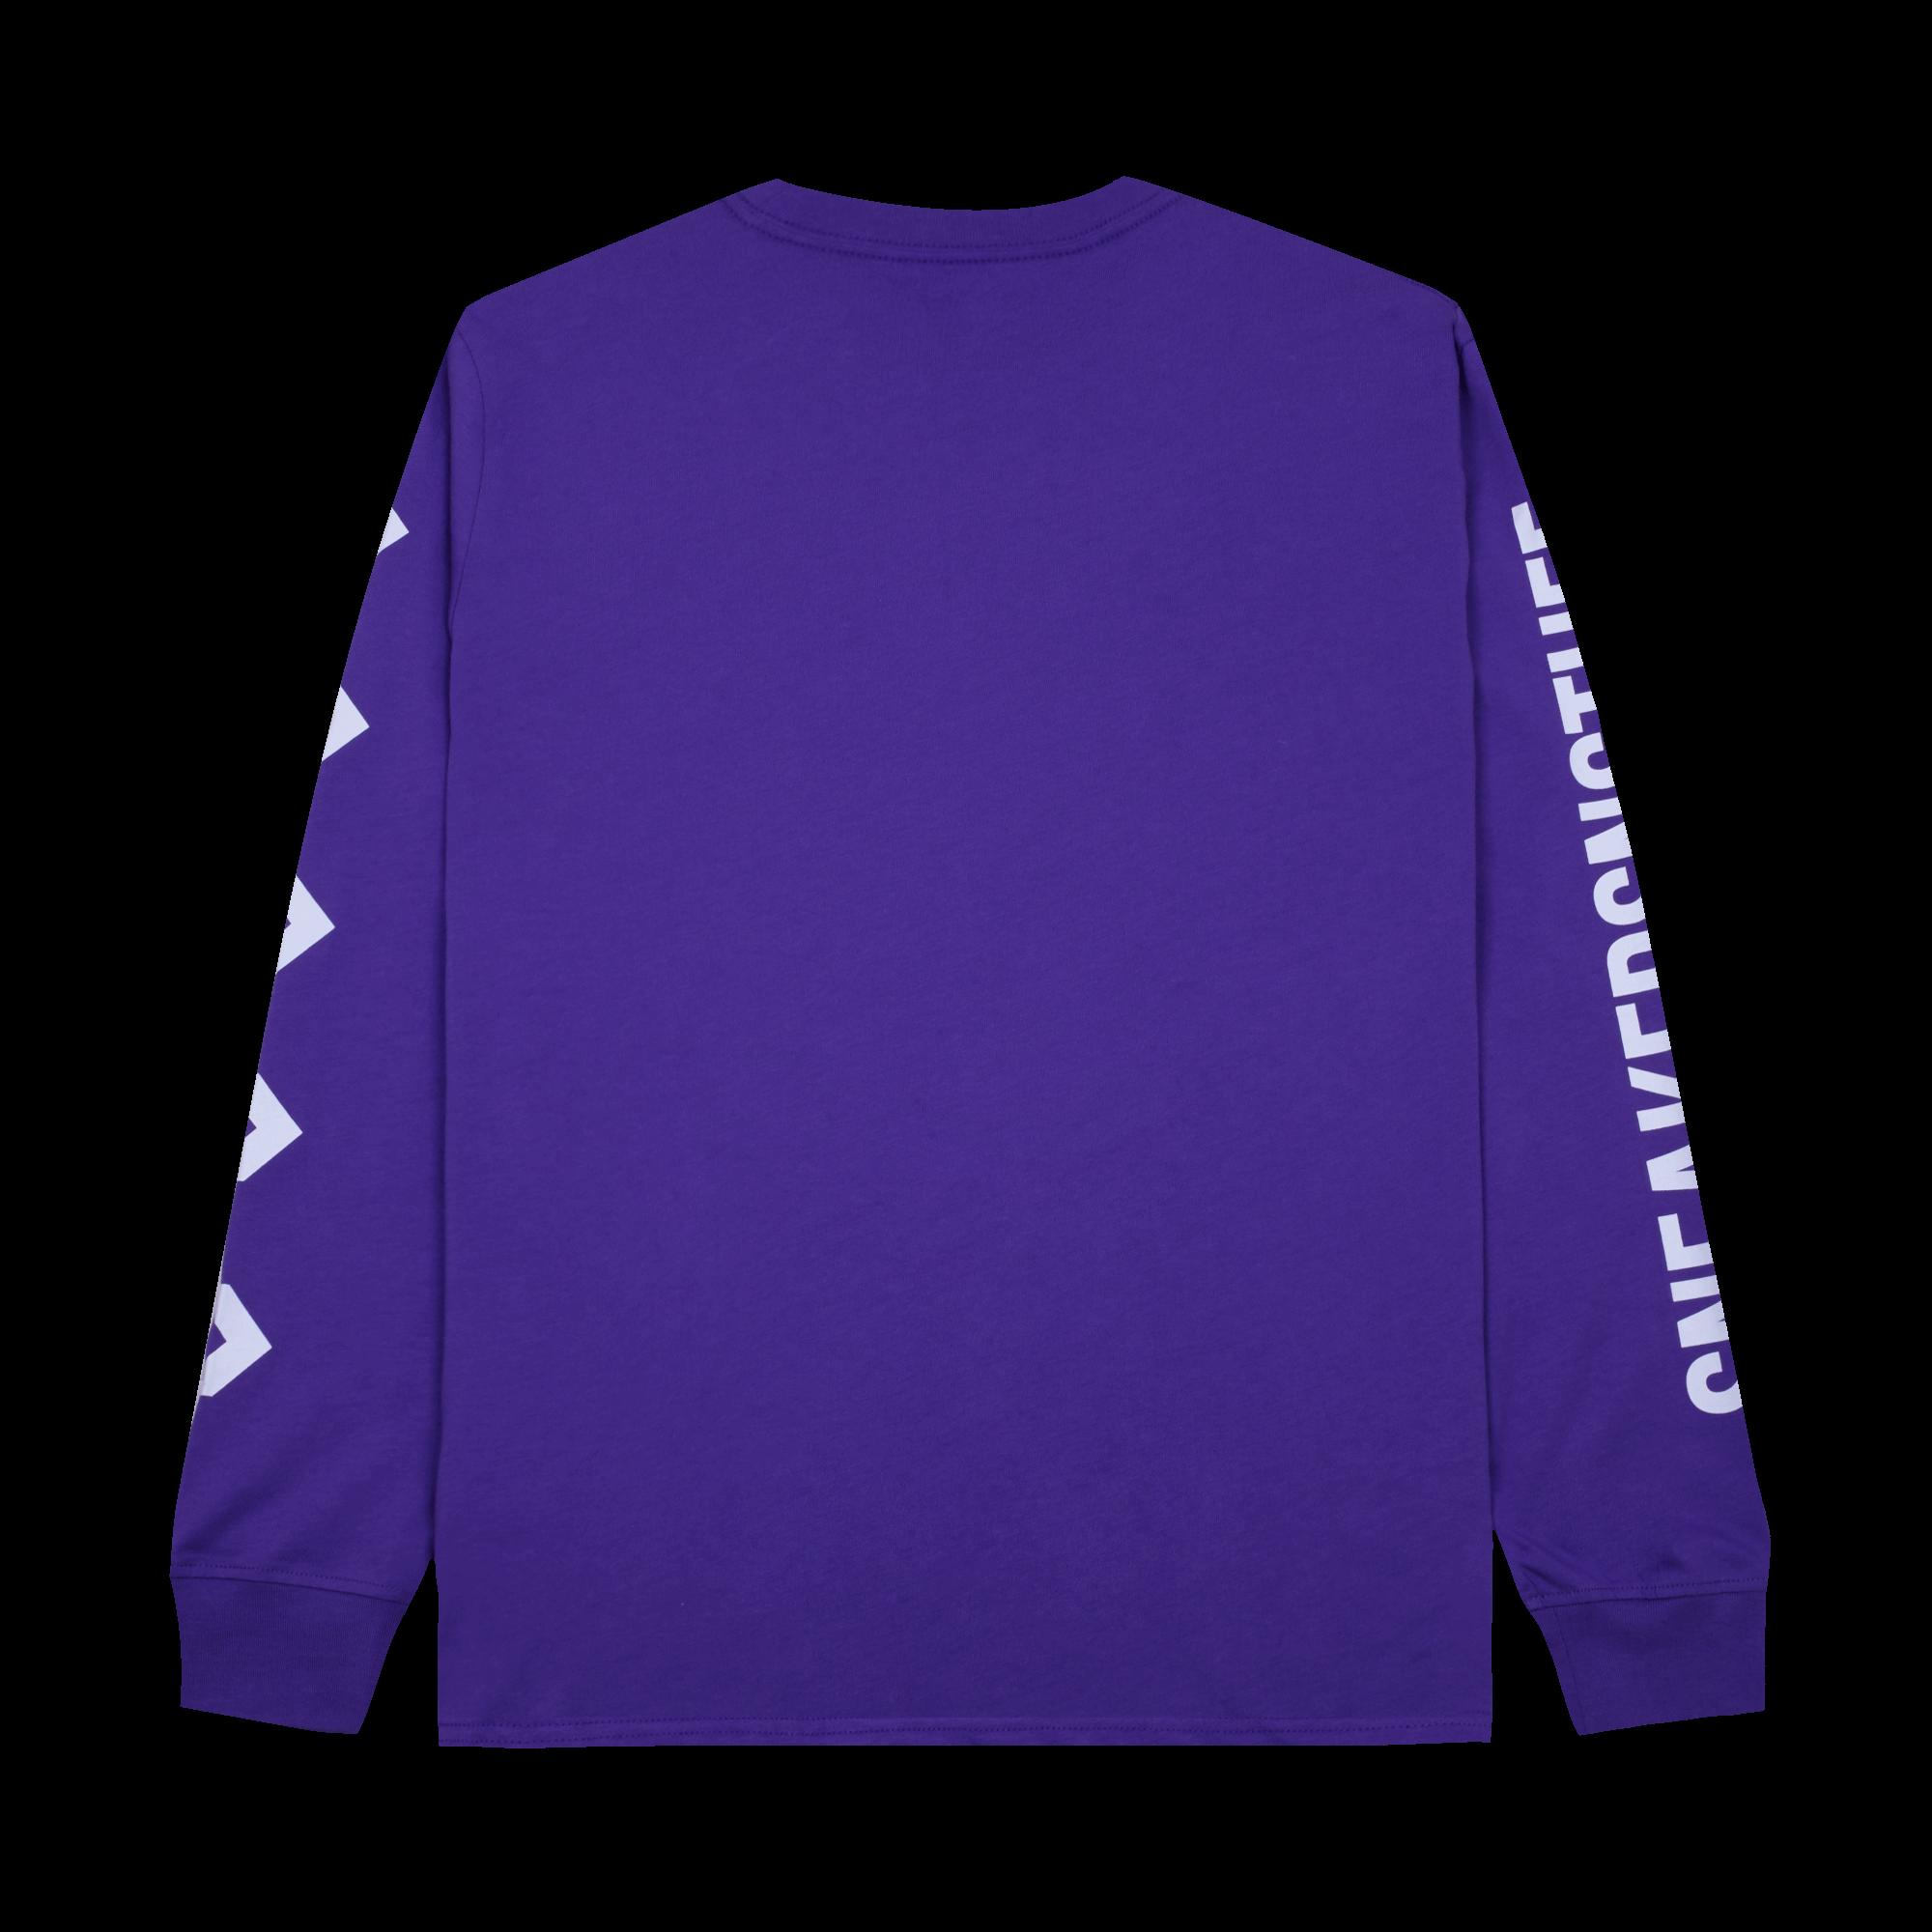 L/S Tee x Sneakersnstuff deep lavender